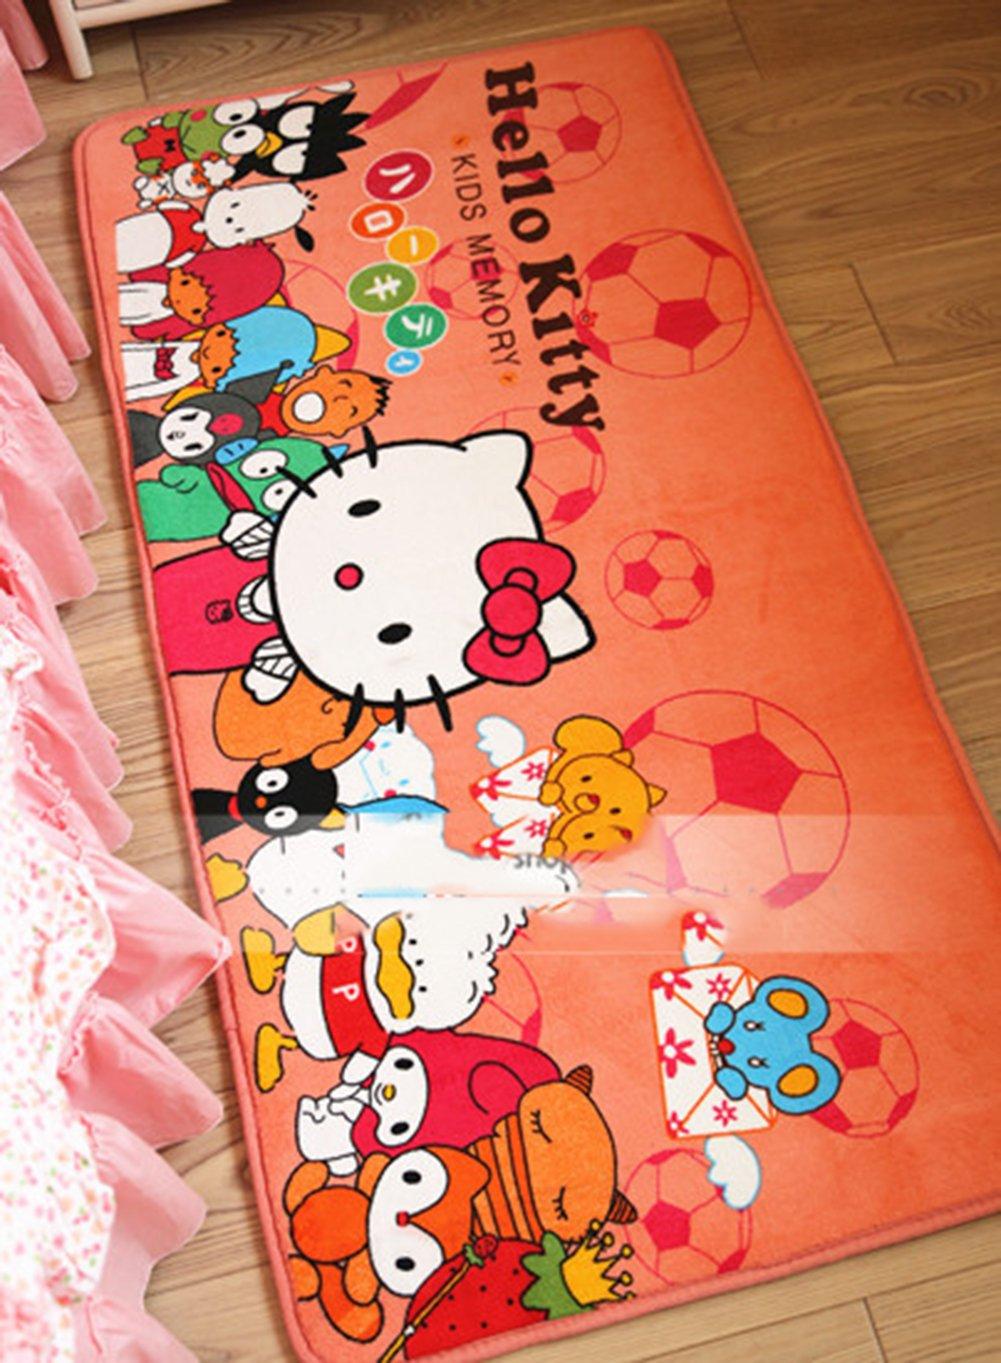 EKEA-Home® Cute Cartoon Hello Kitty Non-Slip Door Mats Soft Children Roon Bed Rug Blue S Faddist Spark Malls-CA